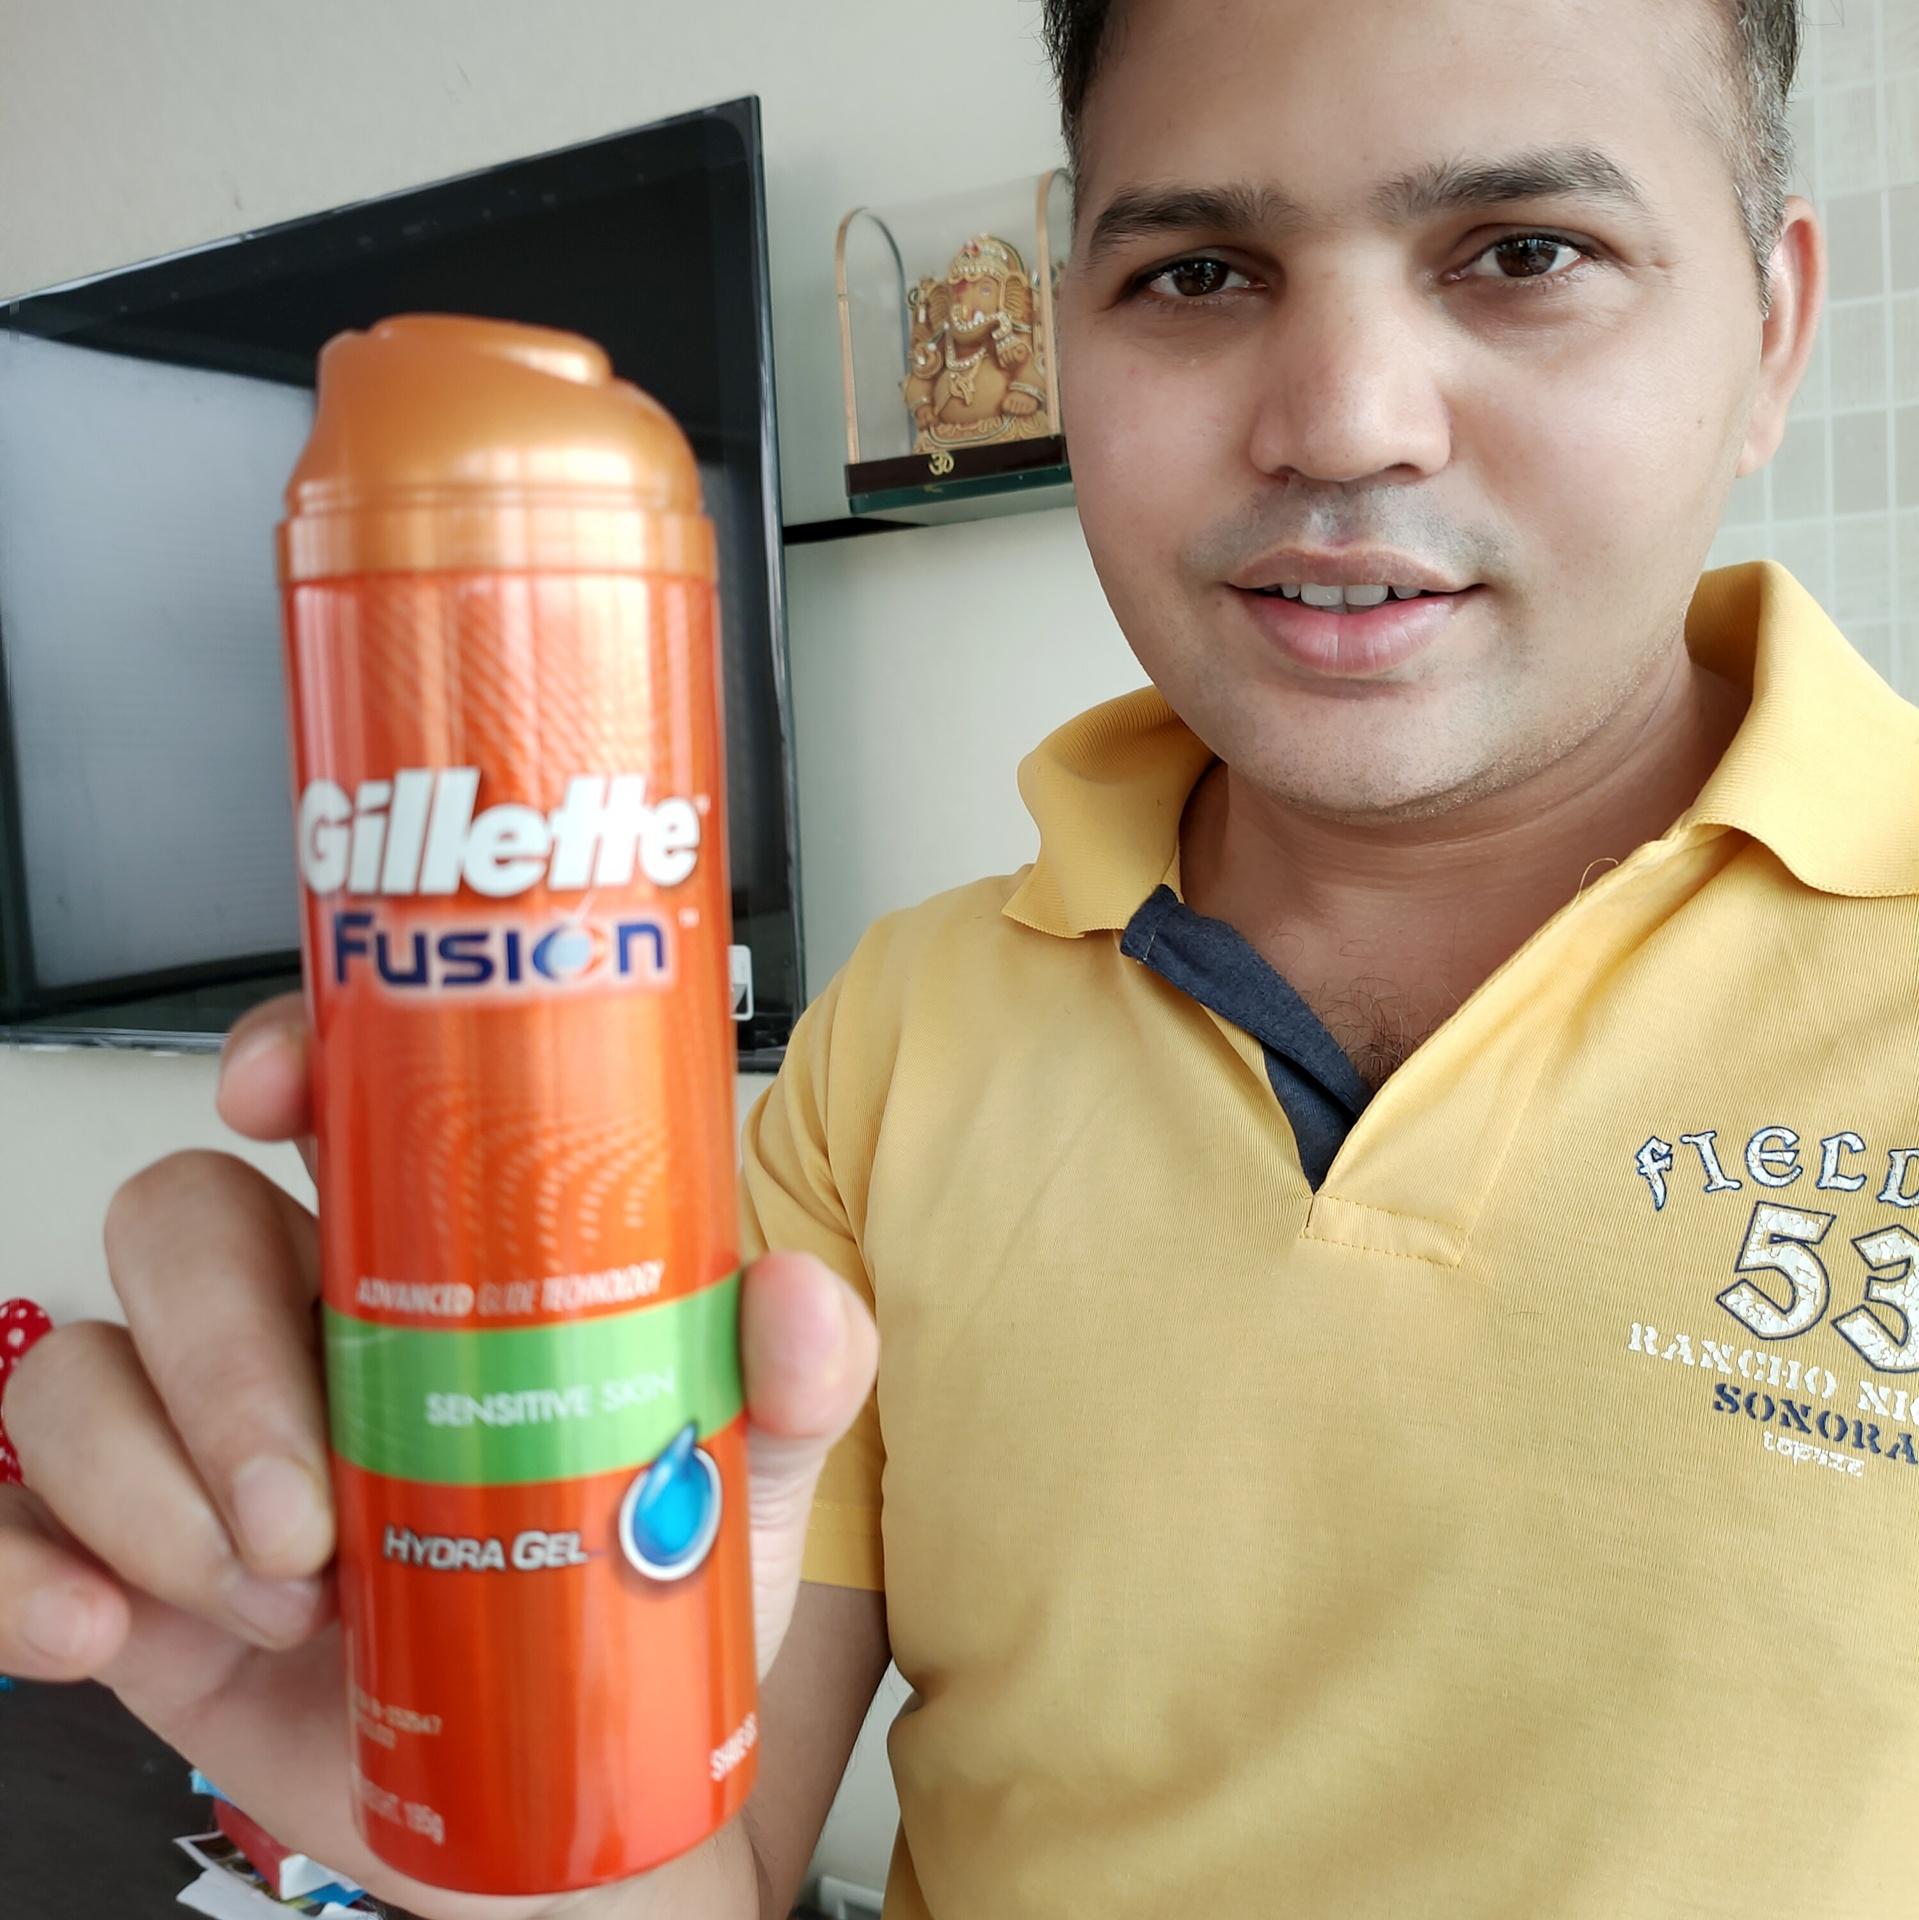 Gillette Fusion Hydra Gel Sensitive Pre Shave Gel-superb shaving product-By manoj_maharana-1